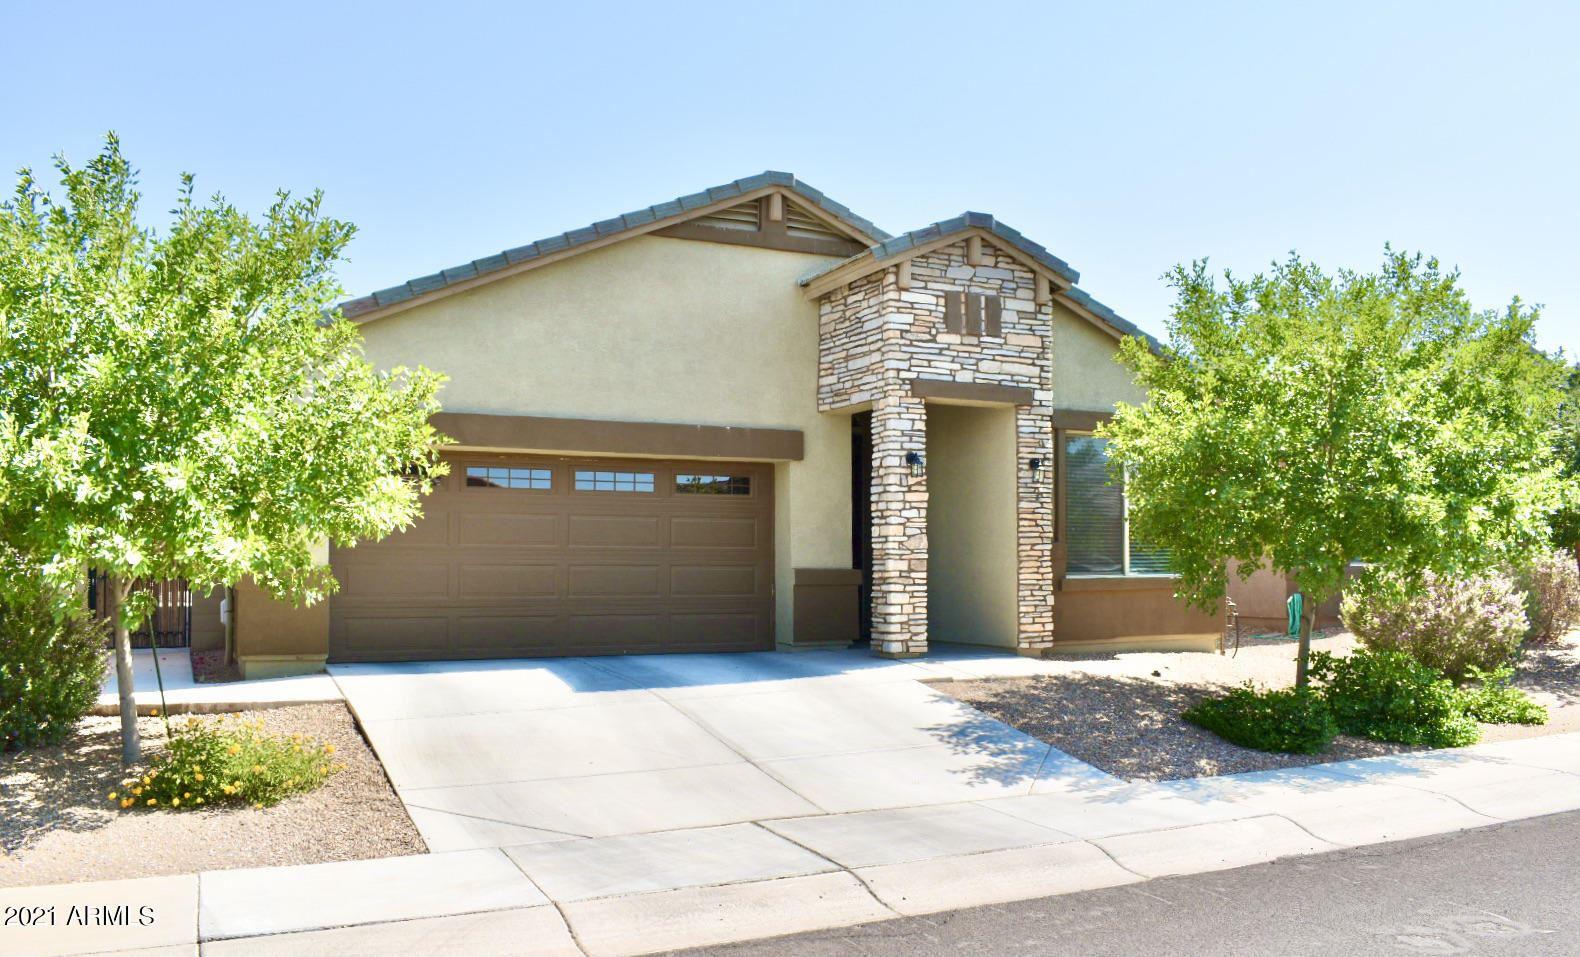 Photo of 41153 W GANLEY Way, Maricopa, AZ 85138 (MLS # 6247016)